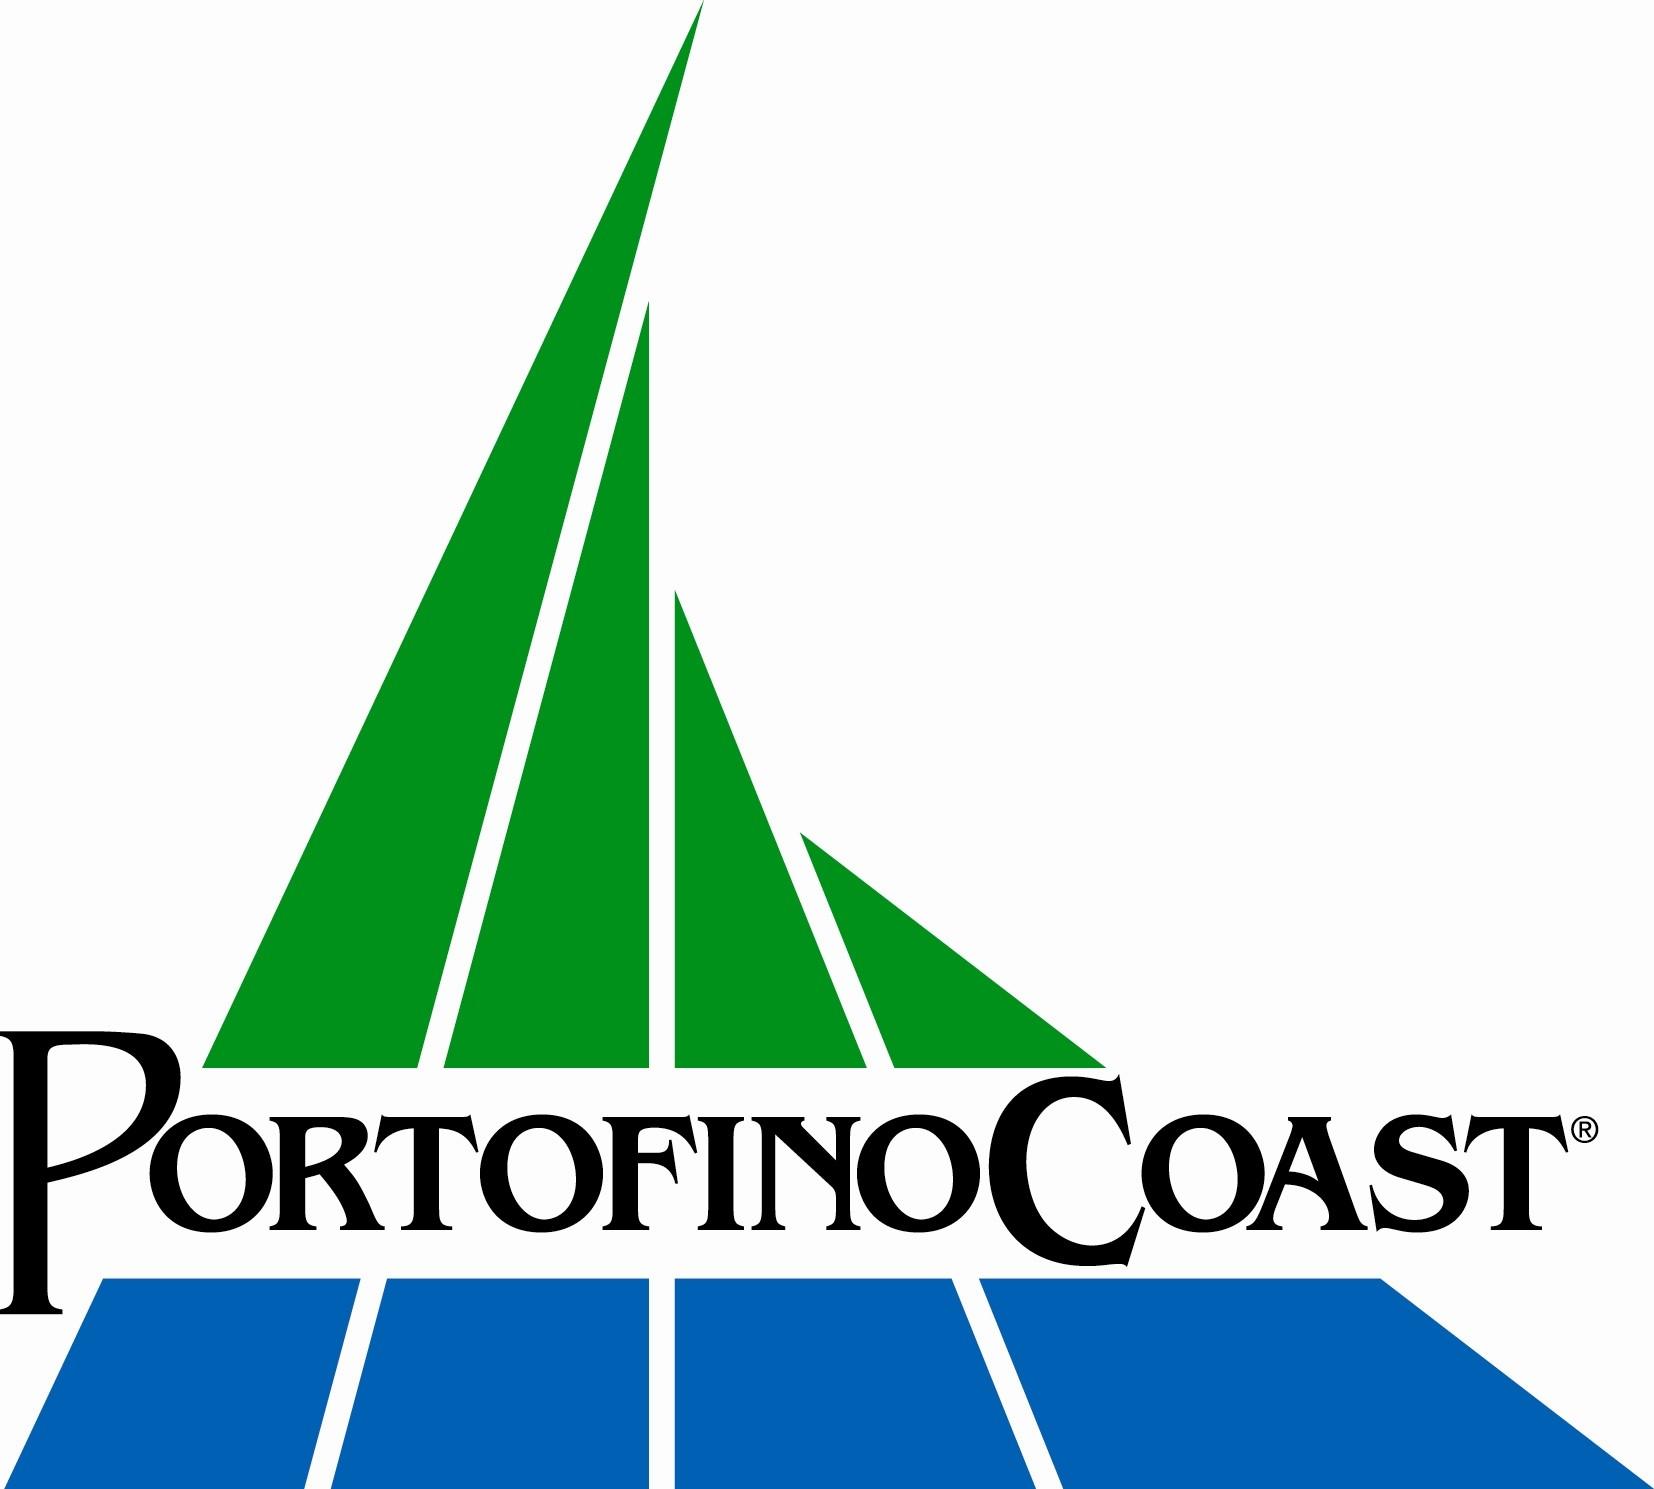 logo portofino coast